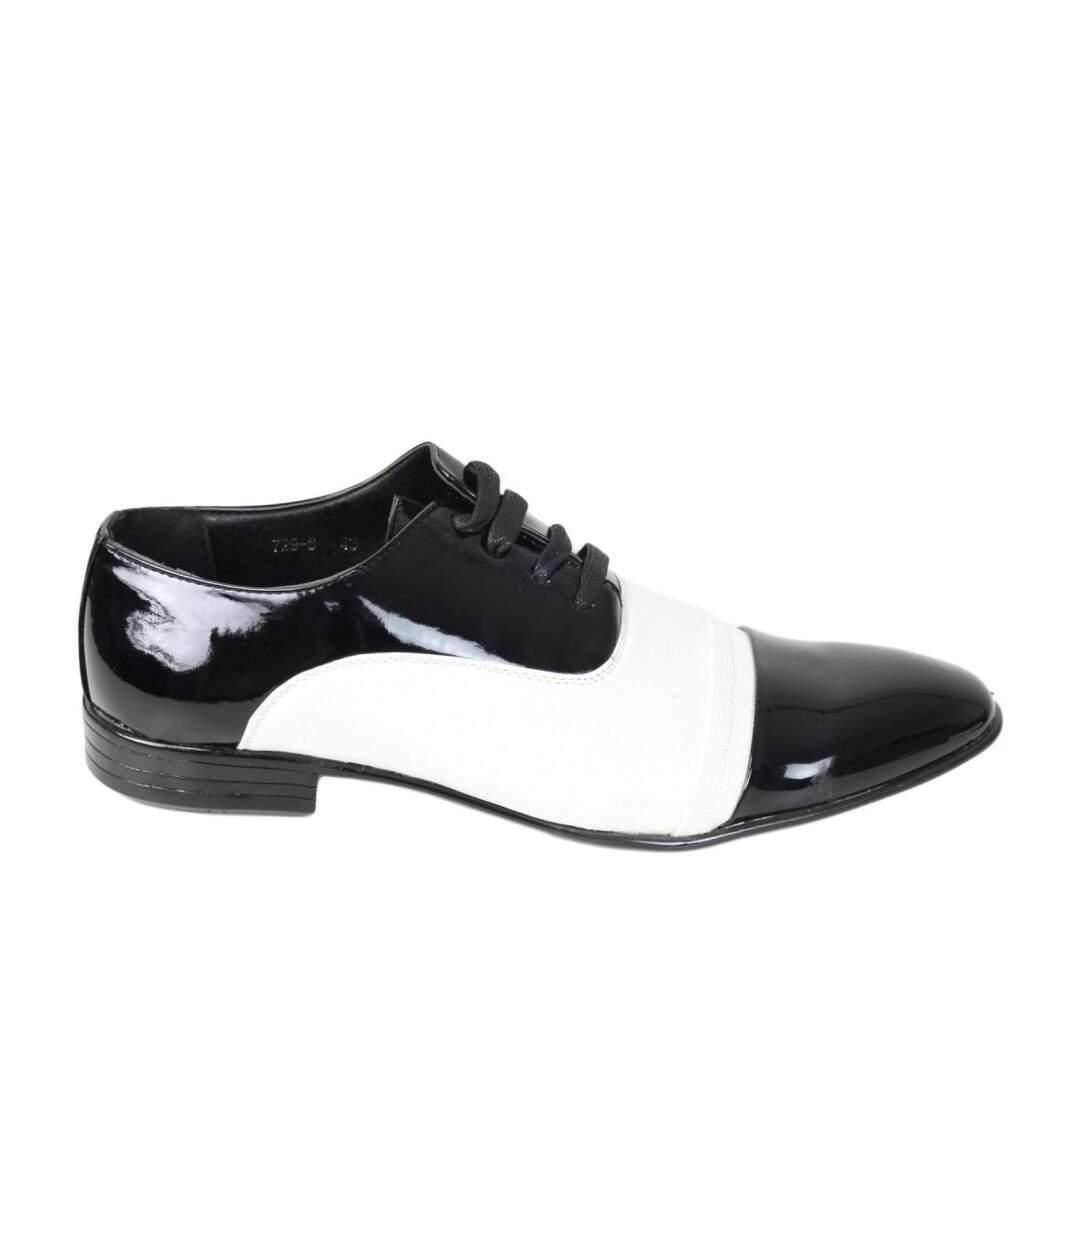 Grande Vente Chaussures Bi-colore vernis dsf.d455nksdKLFHG